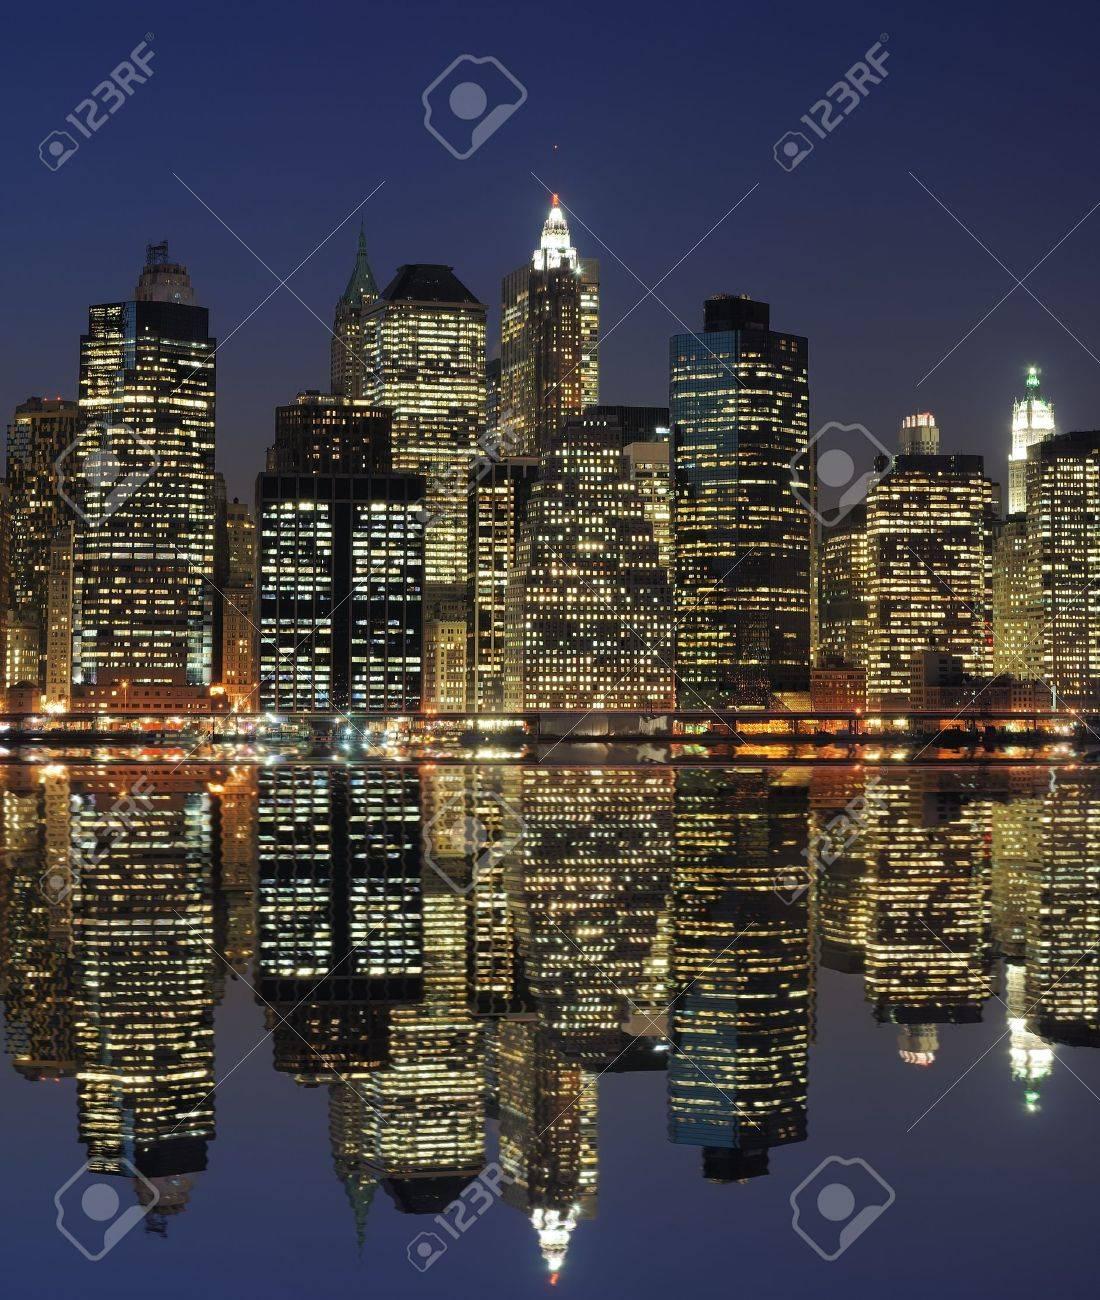 High rises along Lower Manhattan in New York City. Stock Photo - 10065098